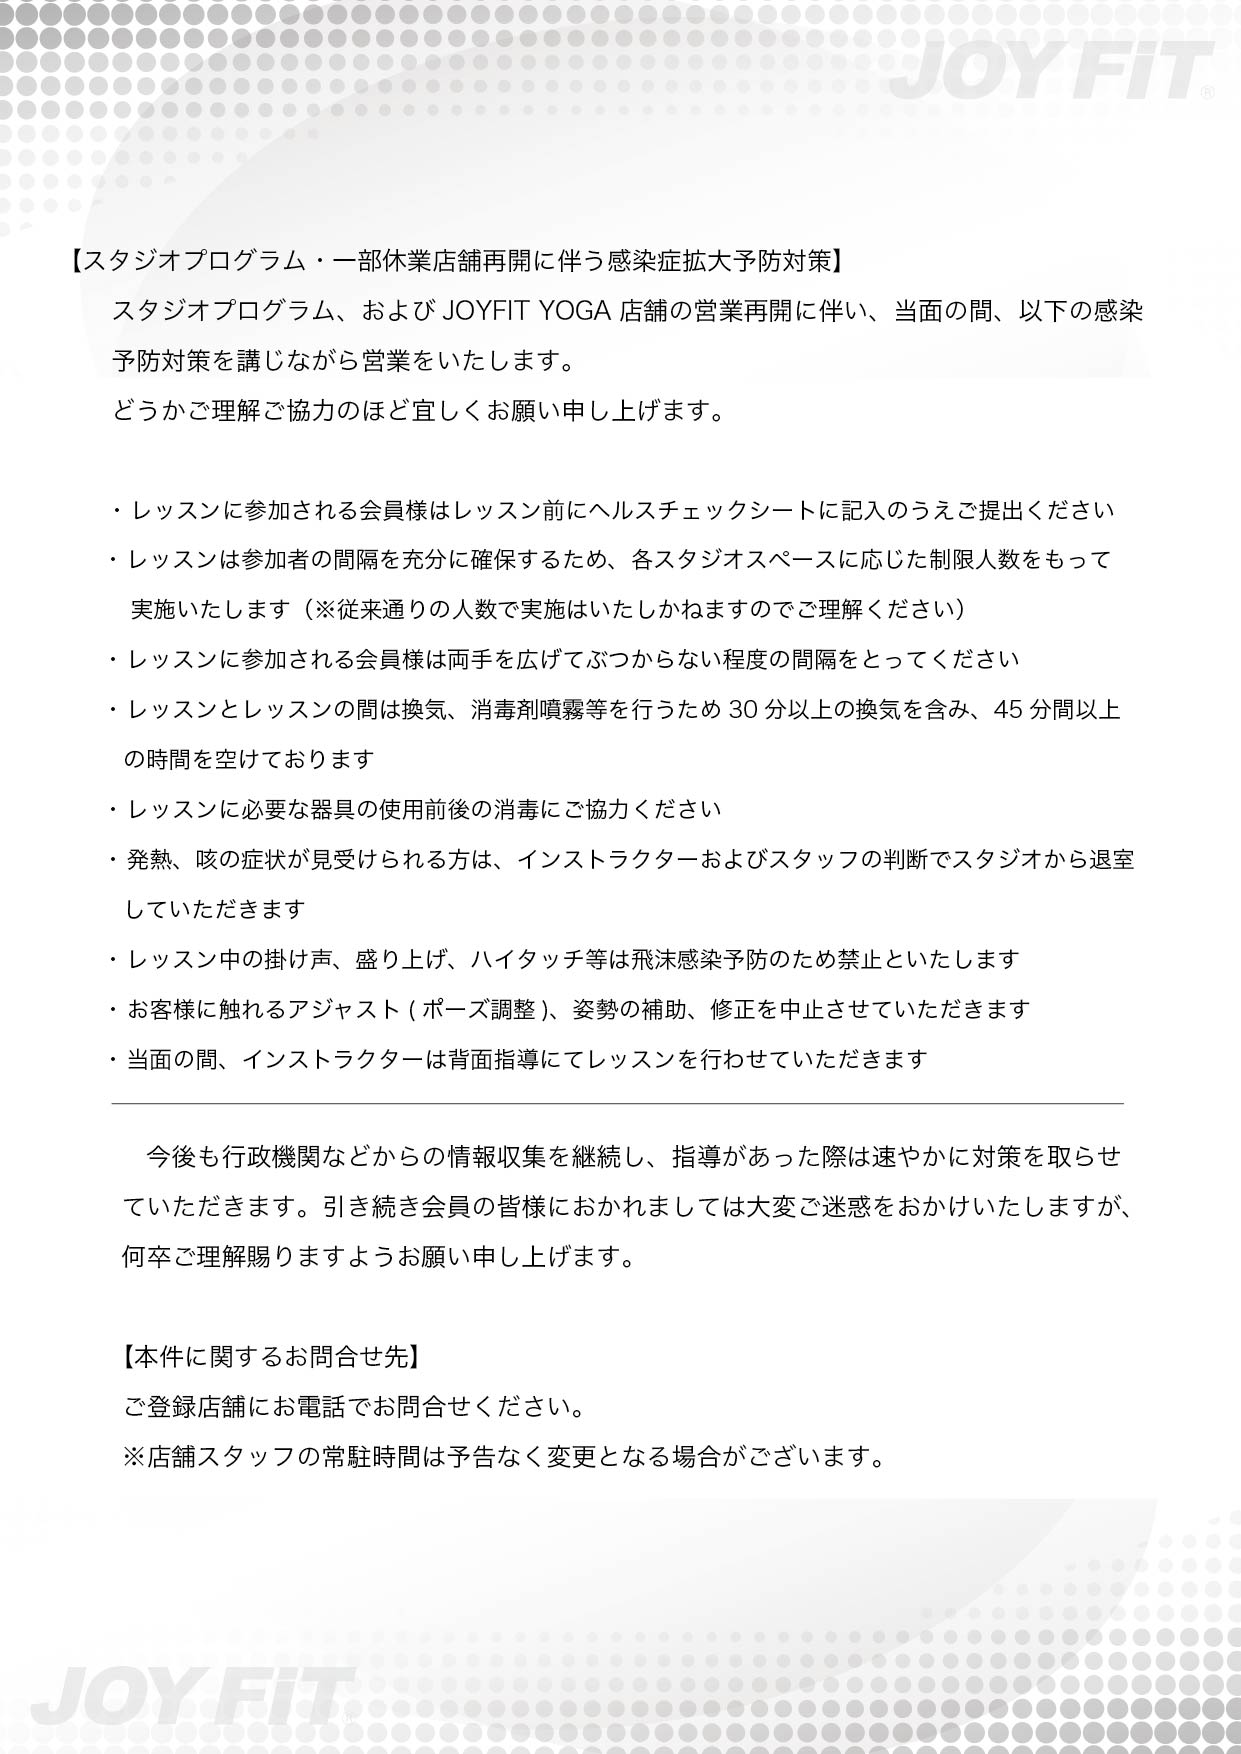 ⑬【JOYFIT】スタジオ・休業店舗・相互利用サービス再開のお知らせ(HP・館内POP・アプリ用)★20200320★-02